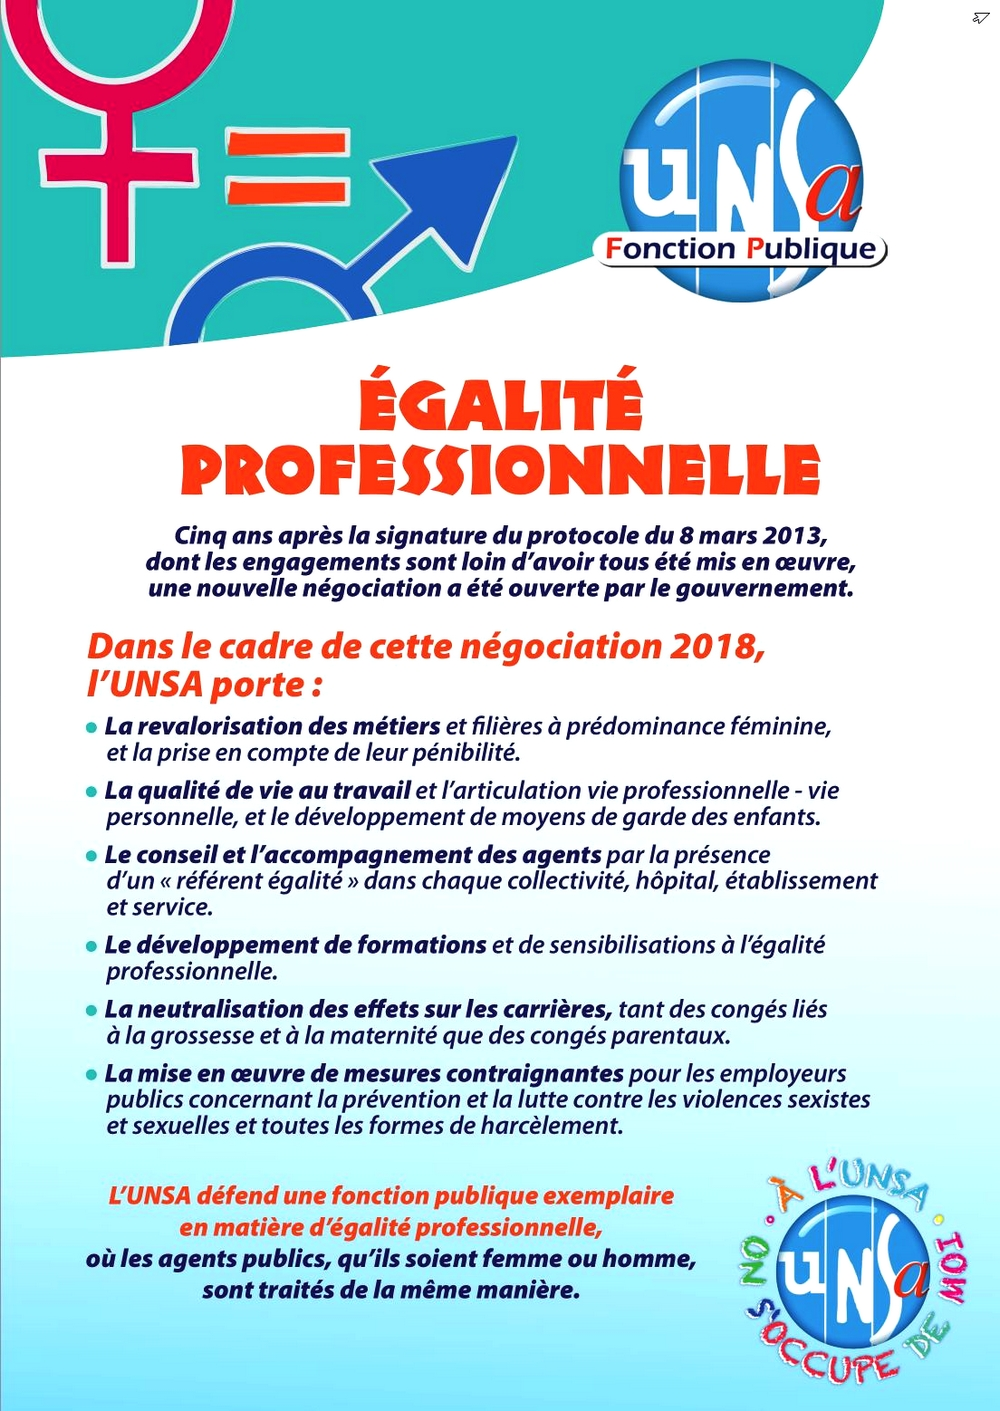 2018 09 24 Tract UNSA FP Egalite pro